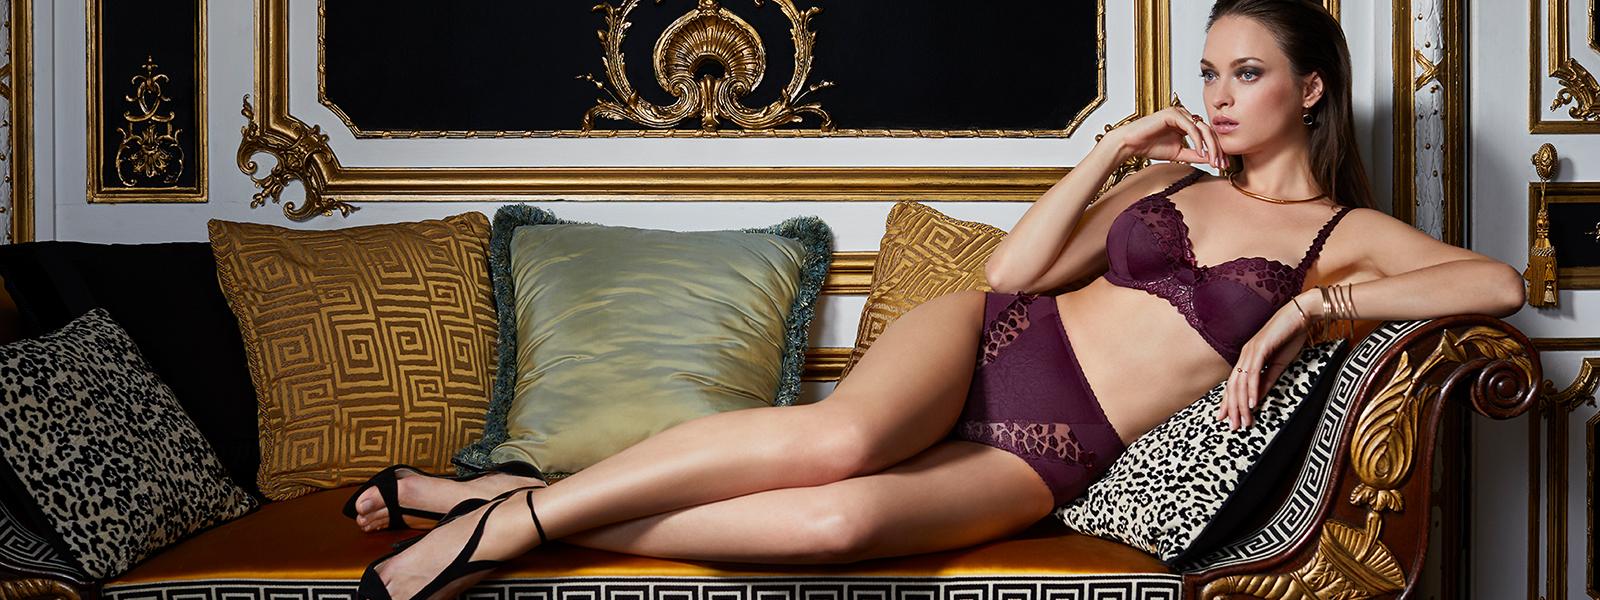 allande lingerie